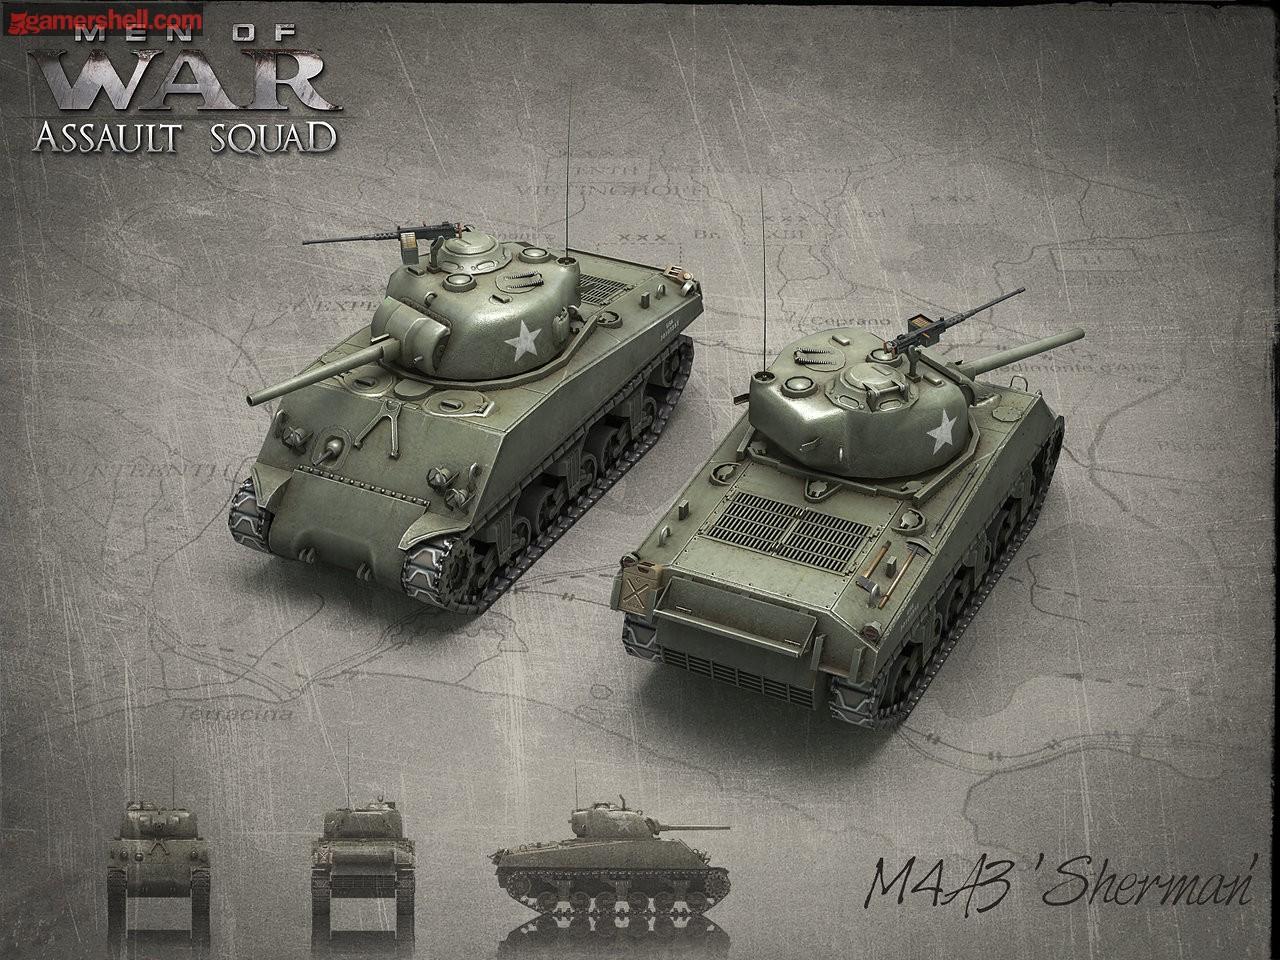 Habemus beta abierto de Men of War: Assault Squad [Gratis!]